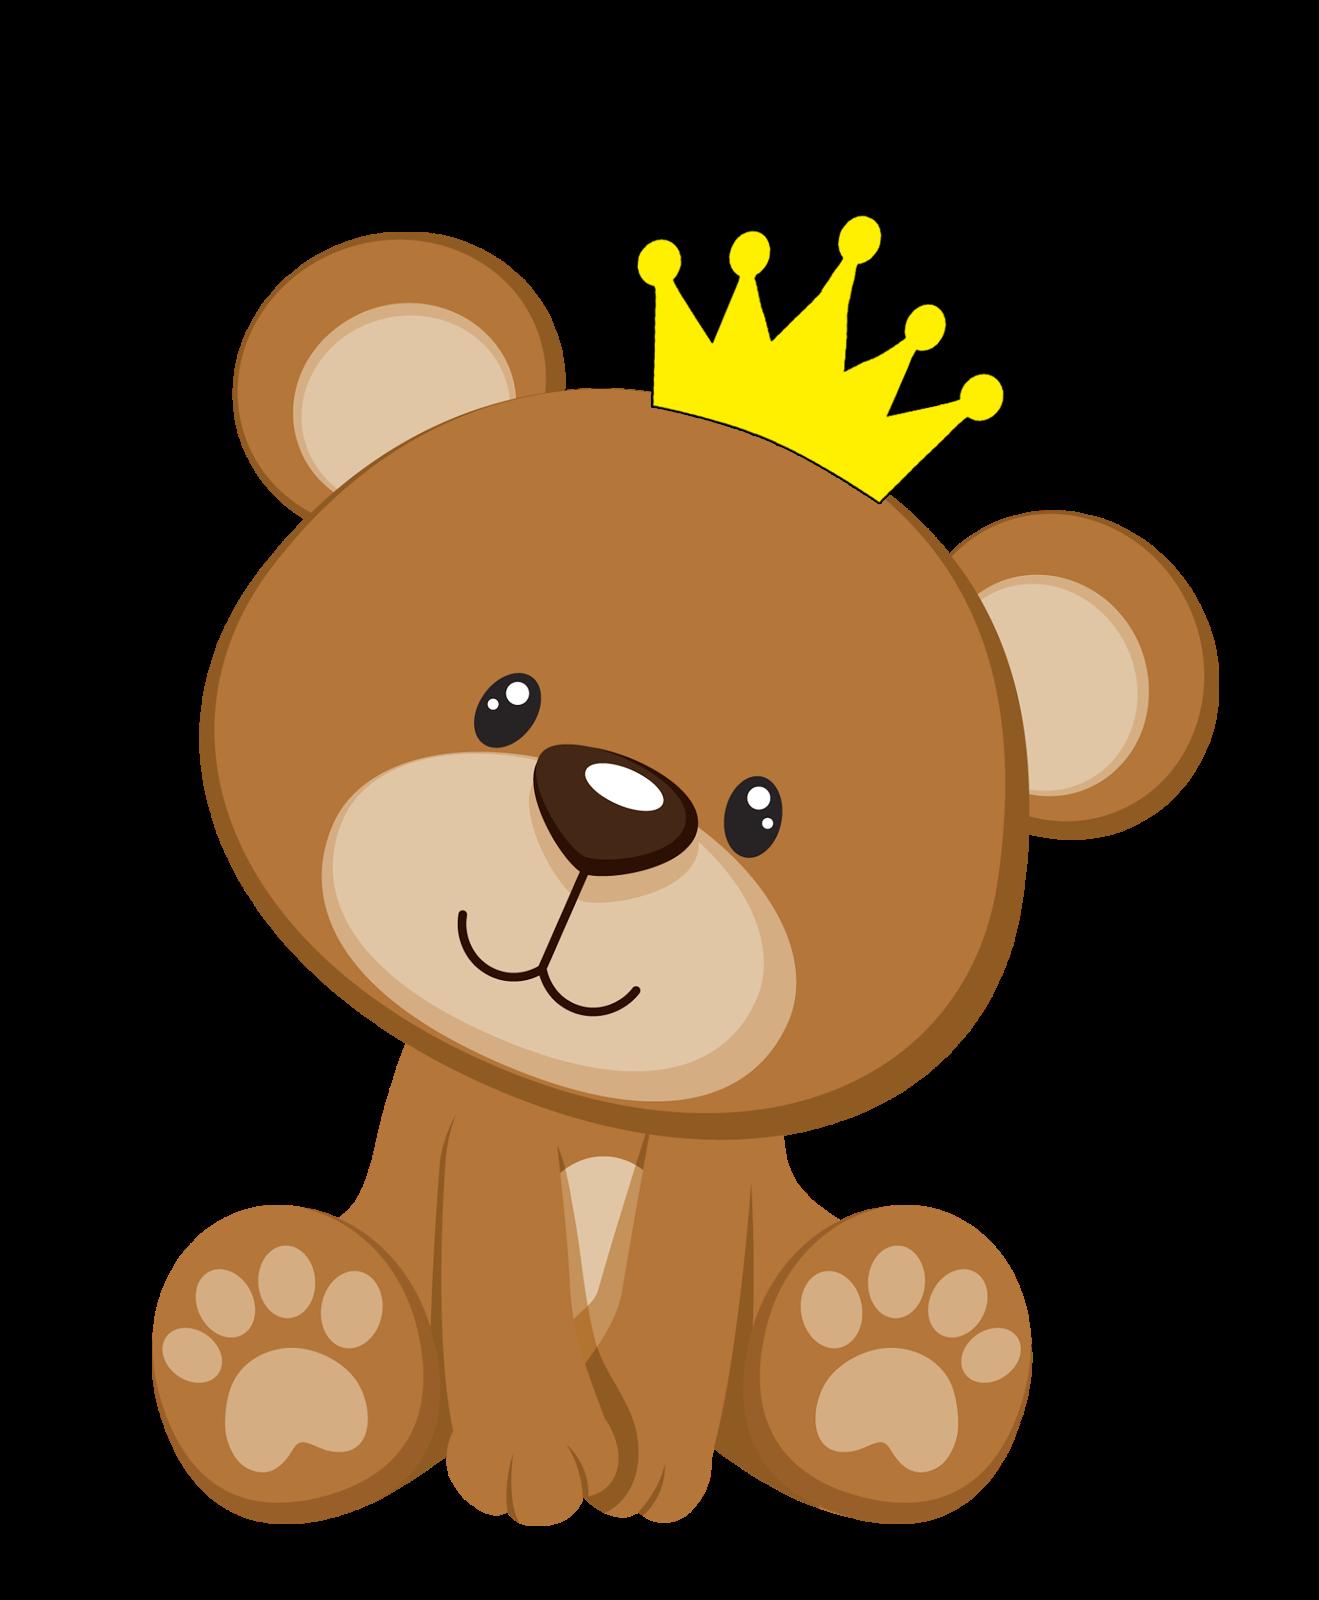 Bebe Ursinho Png ~ Convites Silverbeco Urso Príncipe